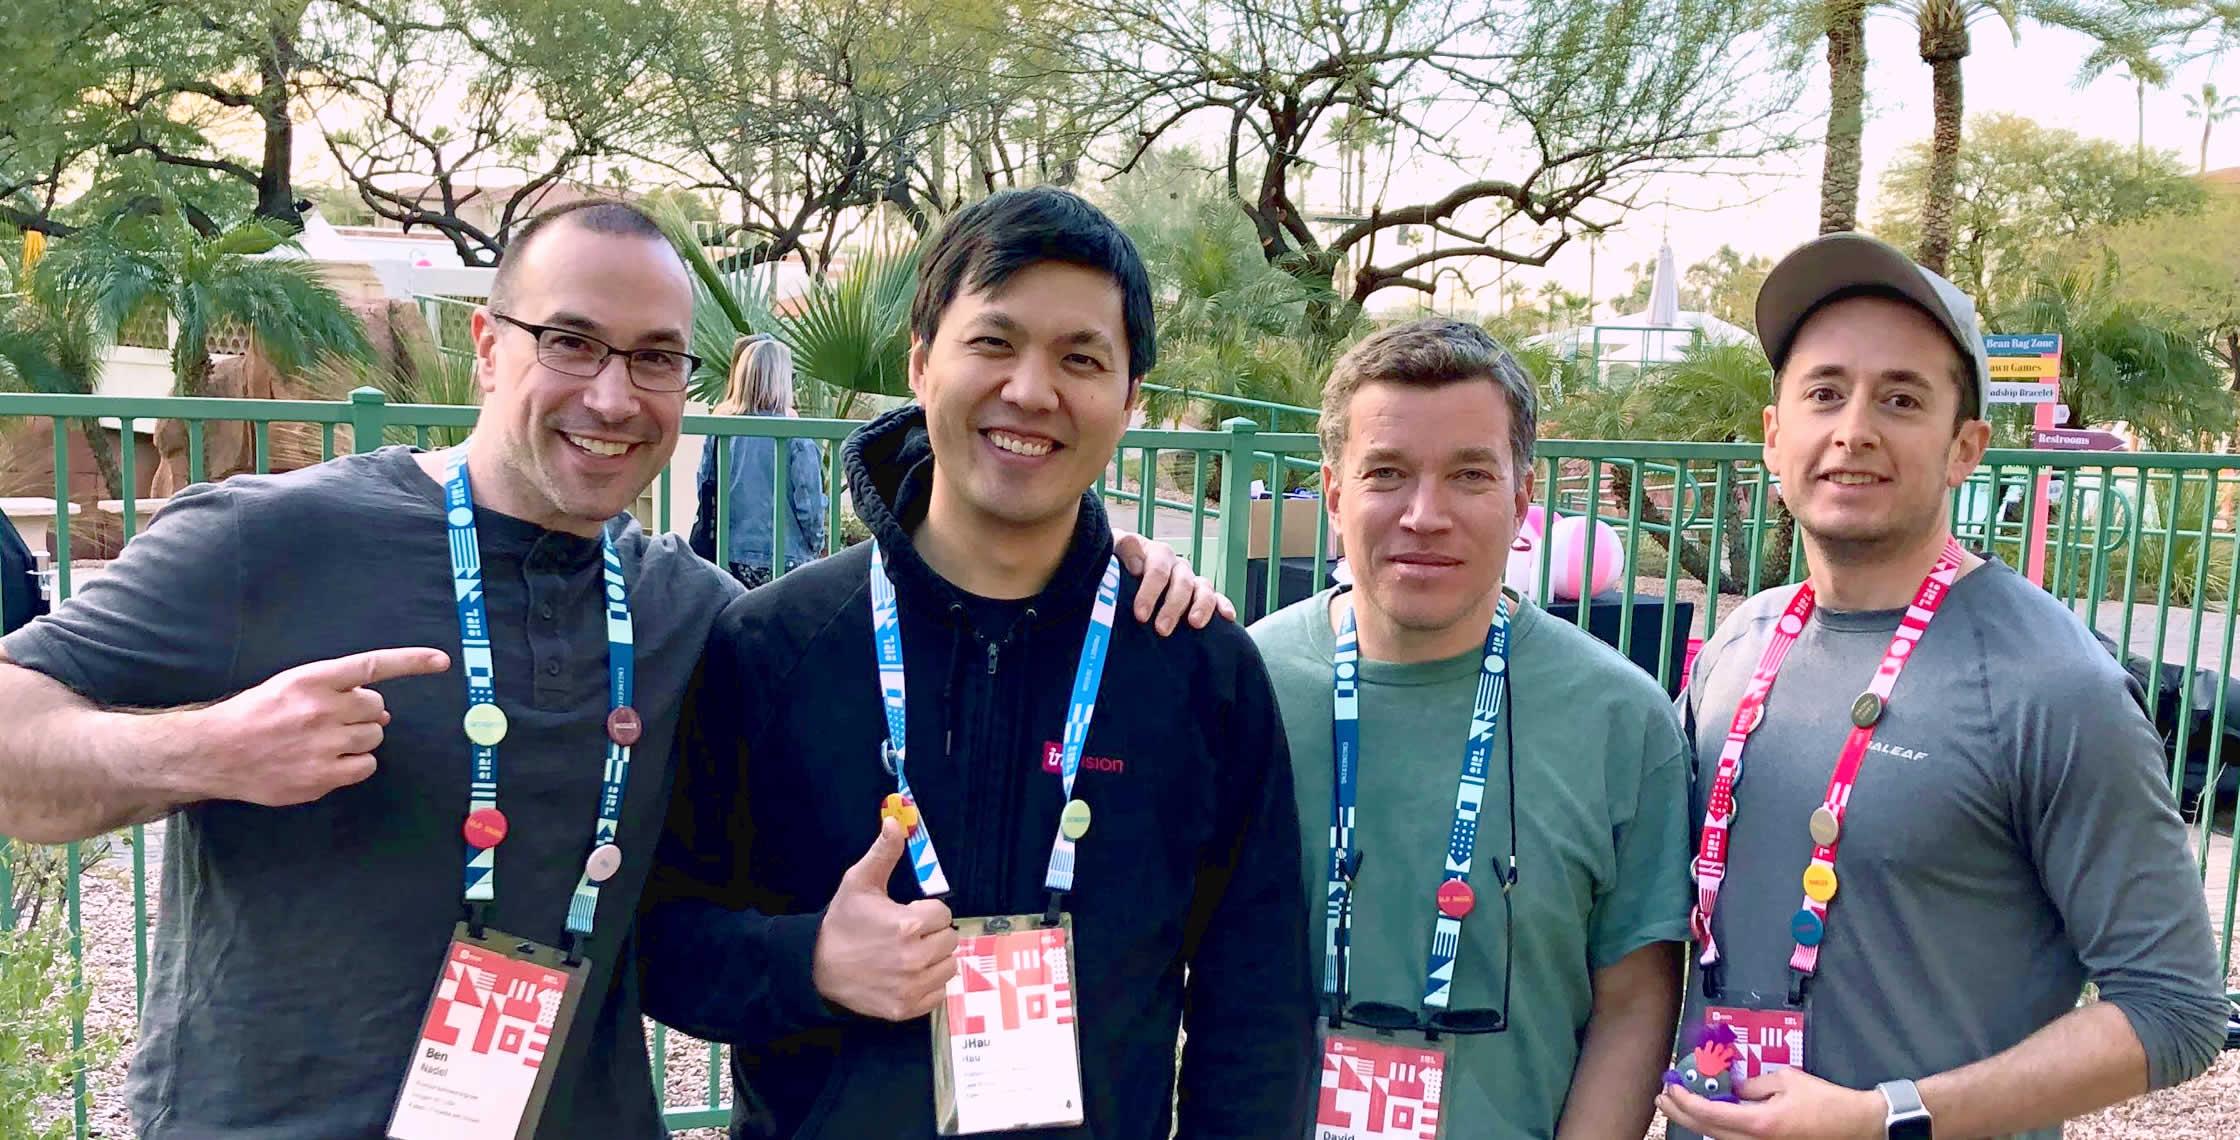 Ben Nadel at InVision In Real Life (IRL) 2019 (Phoenix, AZ) with: Jonathan Hau, David Bainbridge, and Scott Markovits